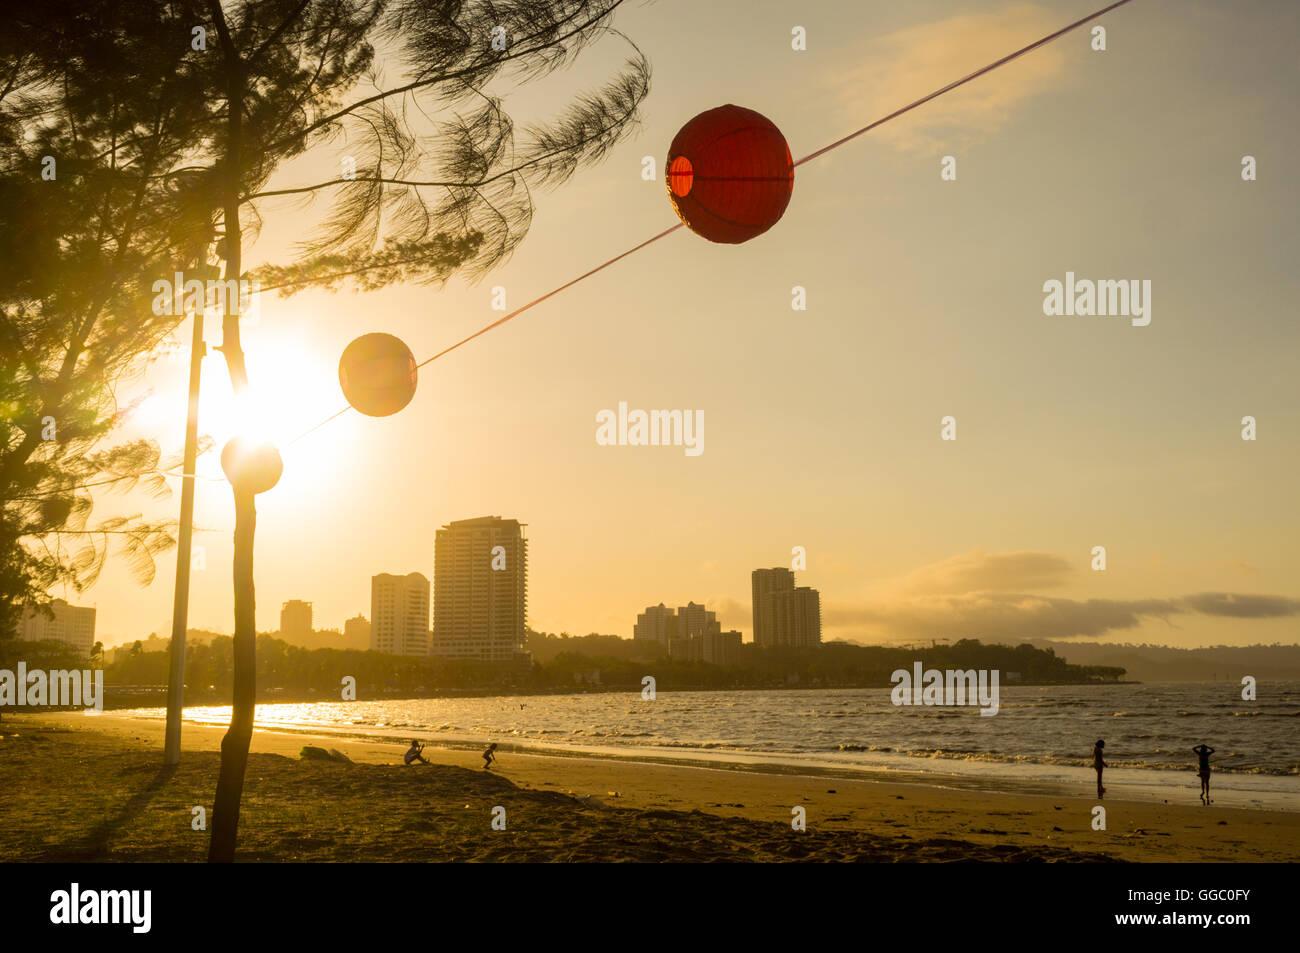 Setting sun over the city of Kota Kinabalu, Sabah, Malaysia Borneo, showing the beach and city skyline. - Stock Image